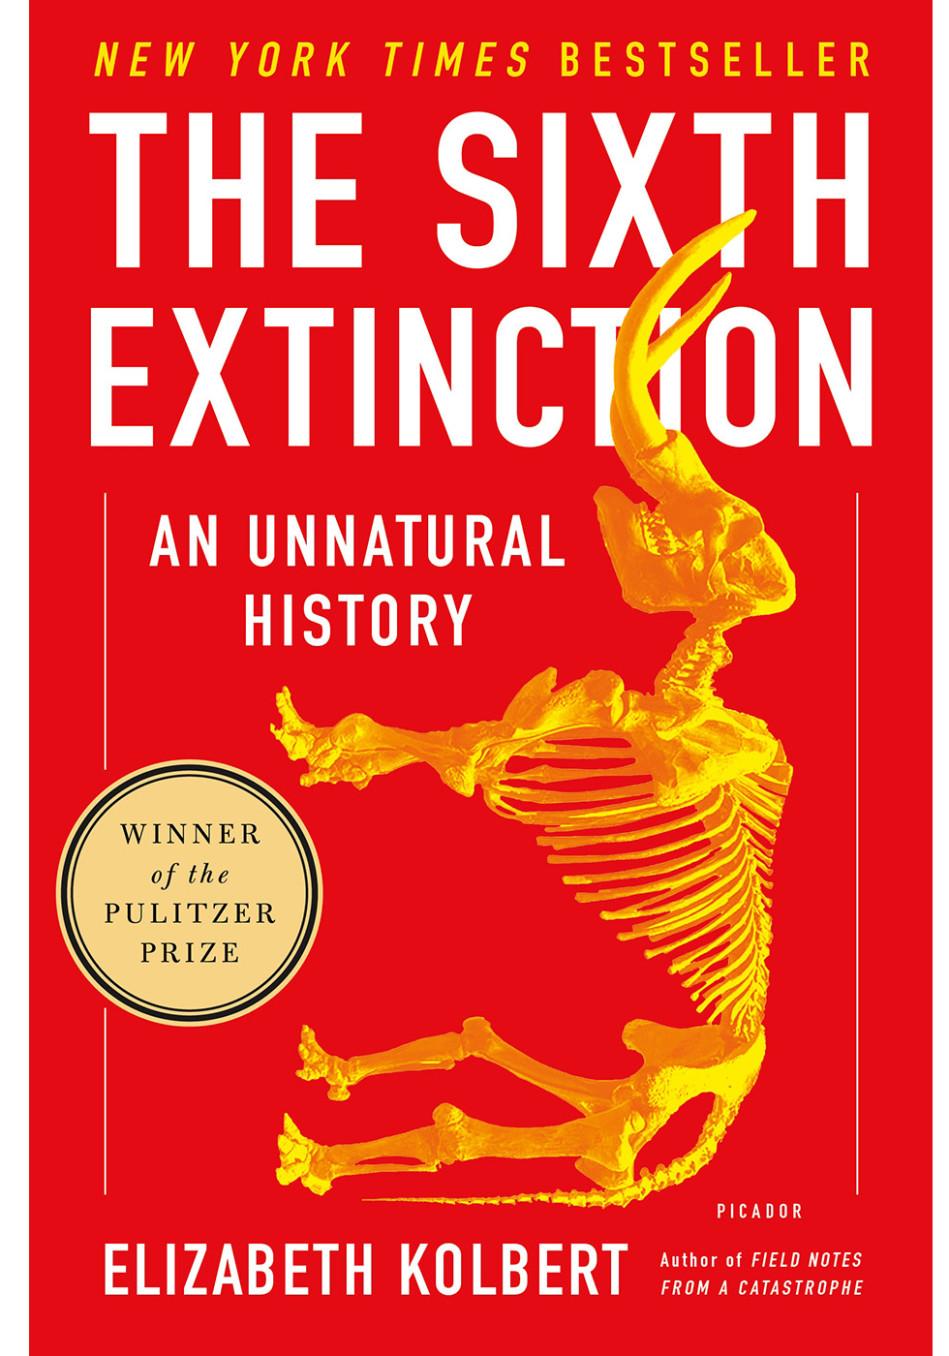 Award Winning Books 2015 The Sixth Extinction